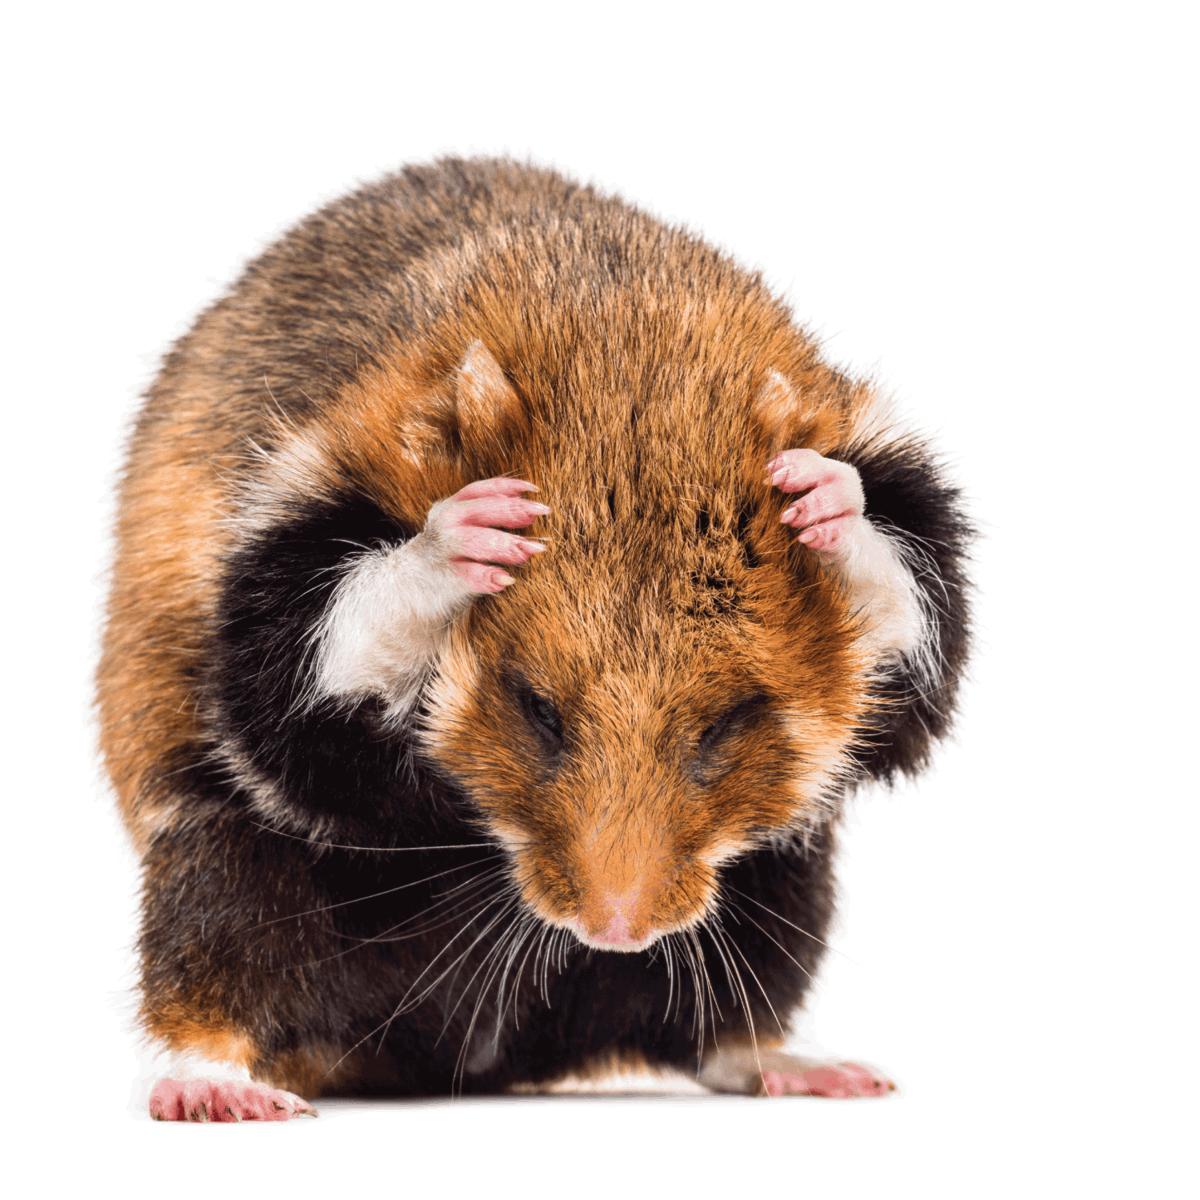 European hamster, Cricetus cricetus, grooming